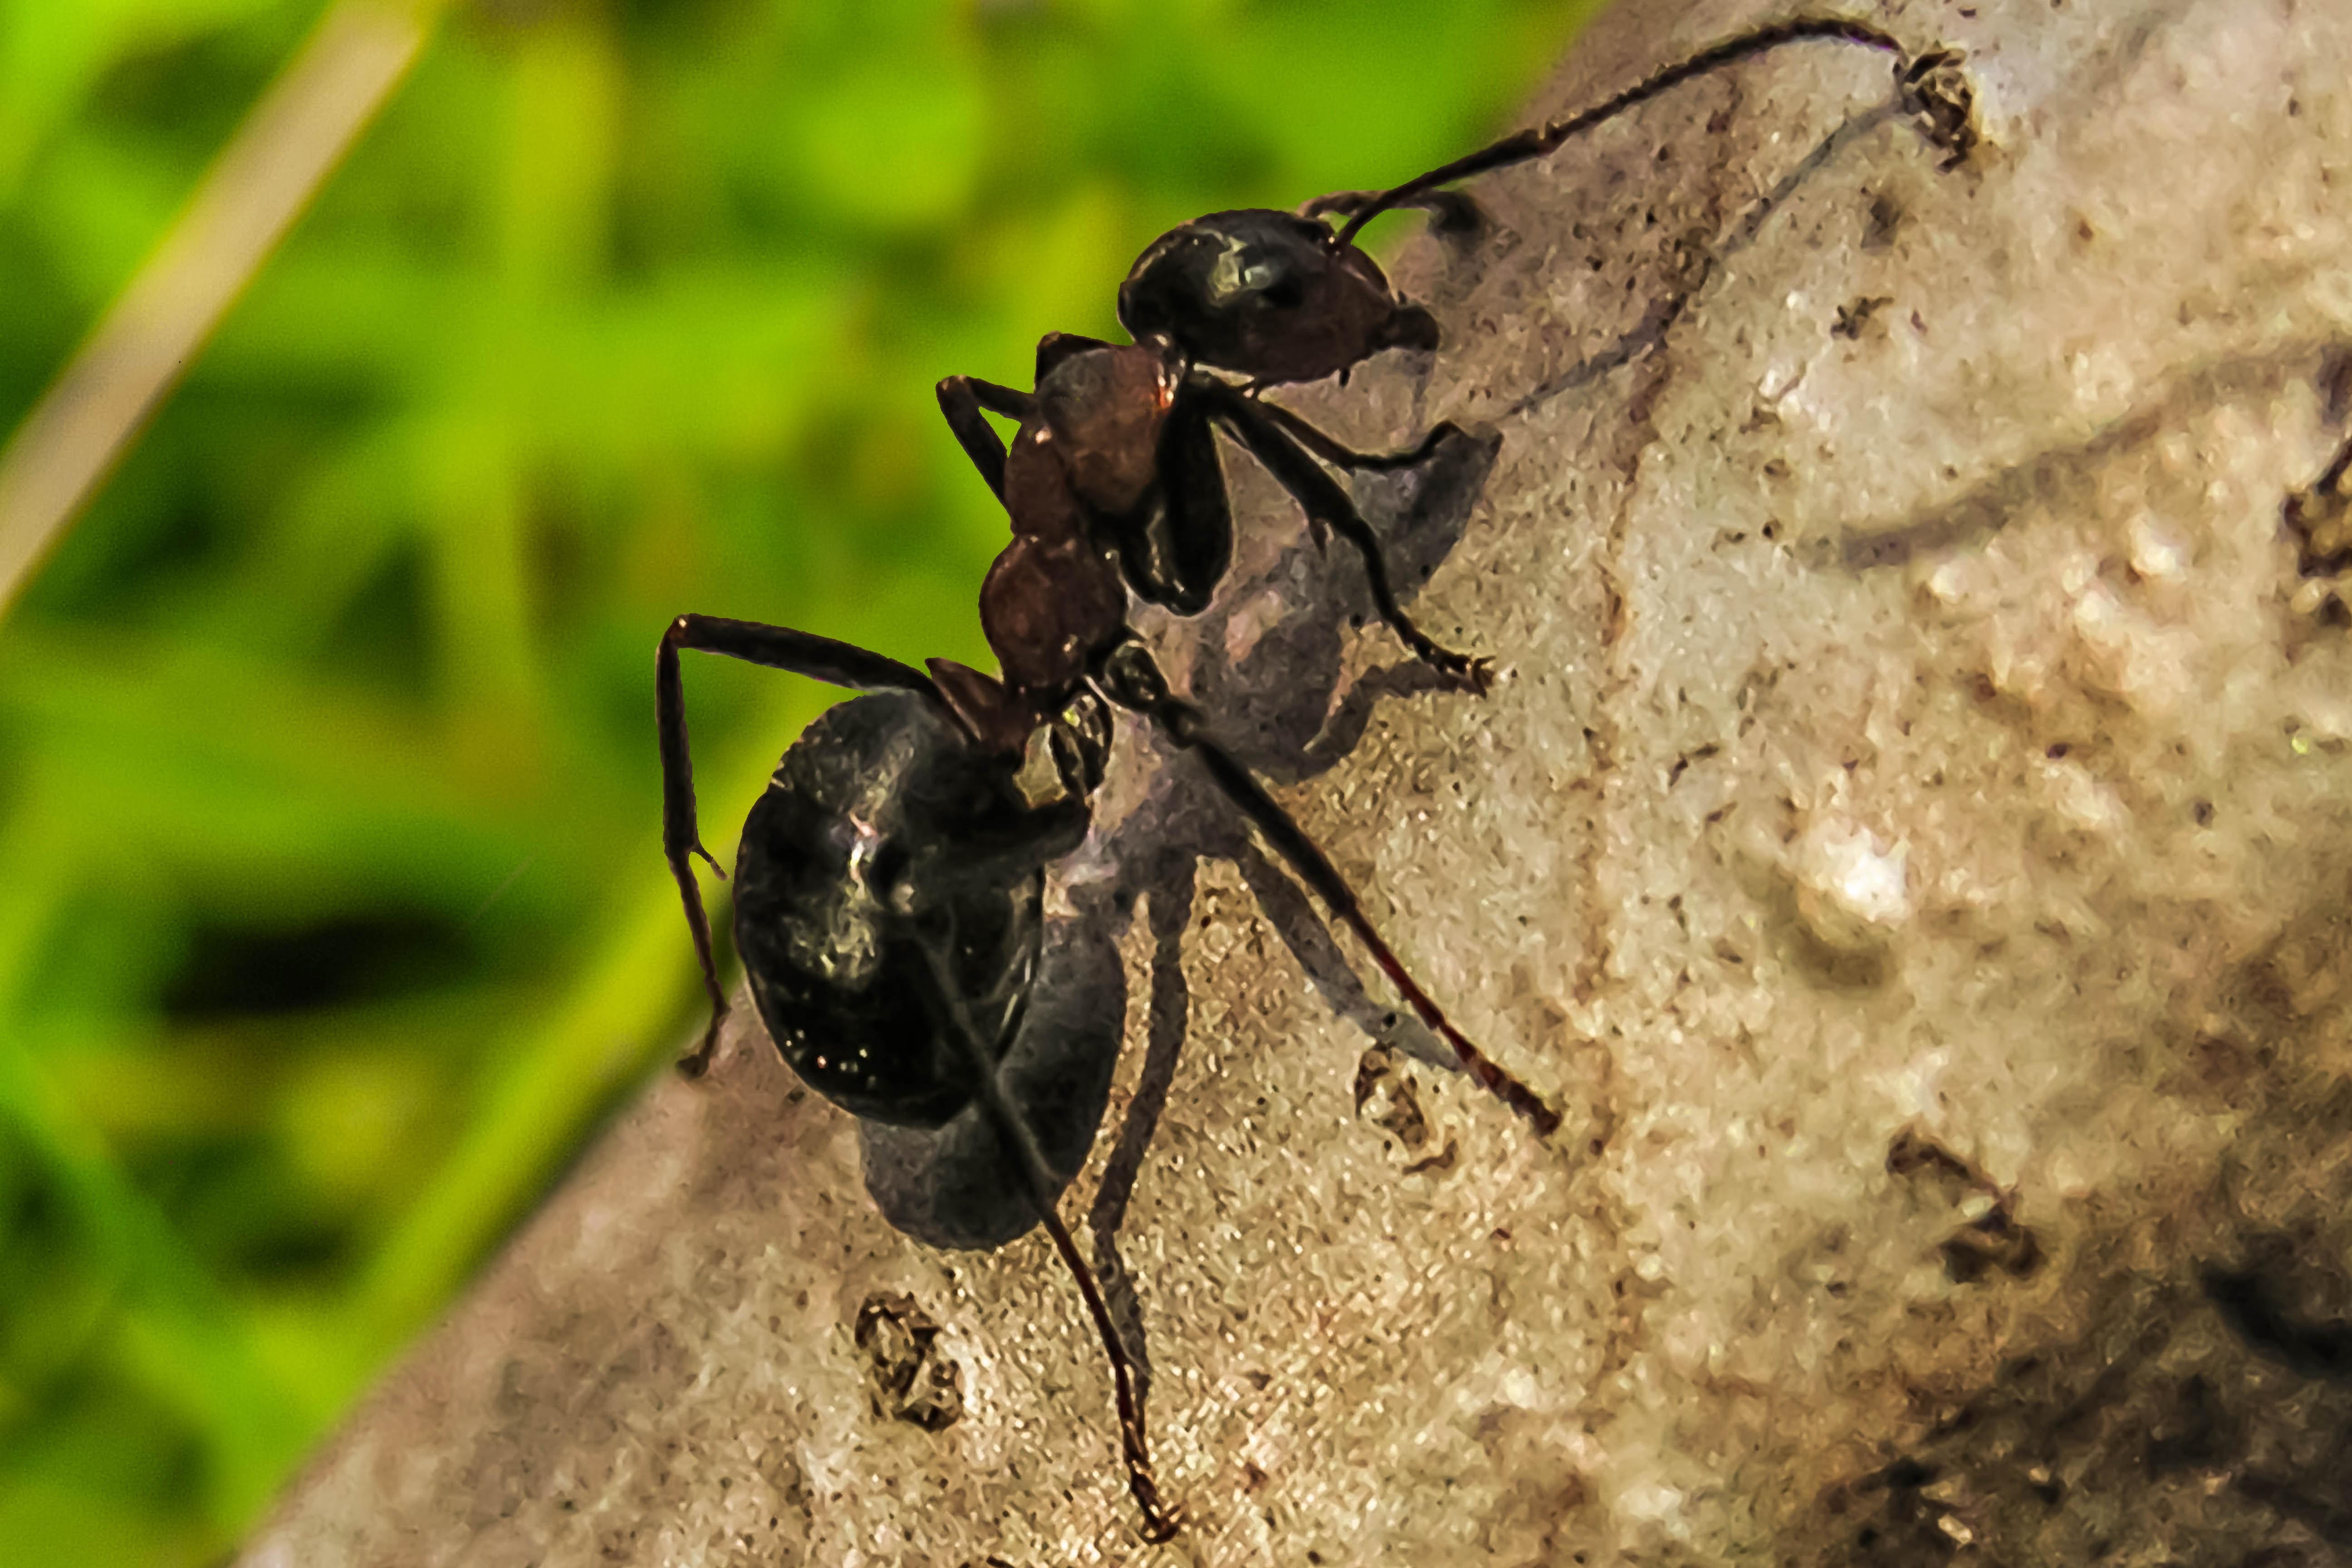 очень муравей фото или картинки тесто